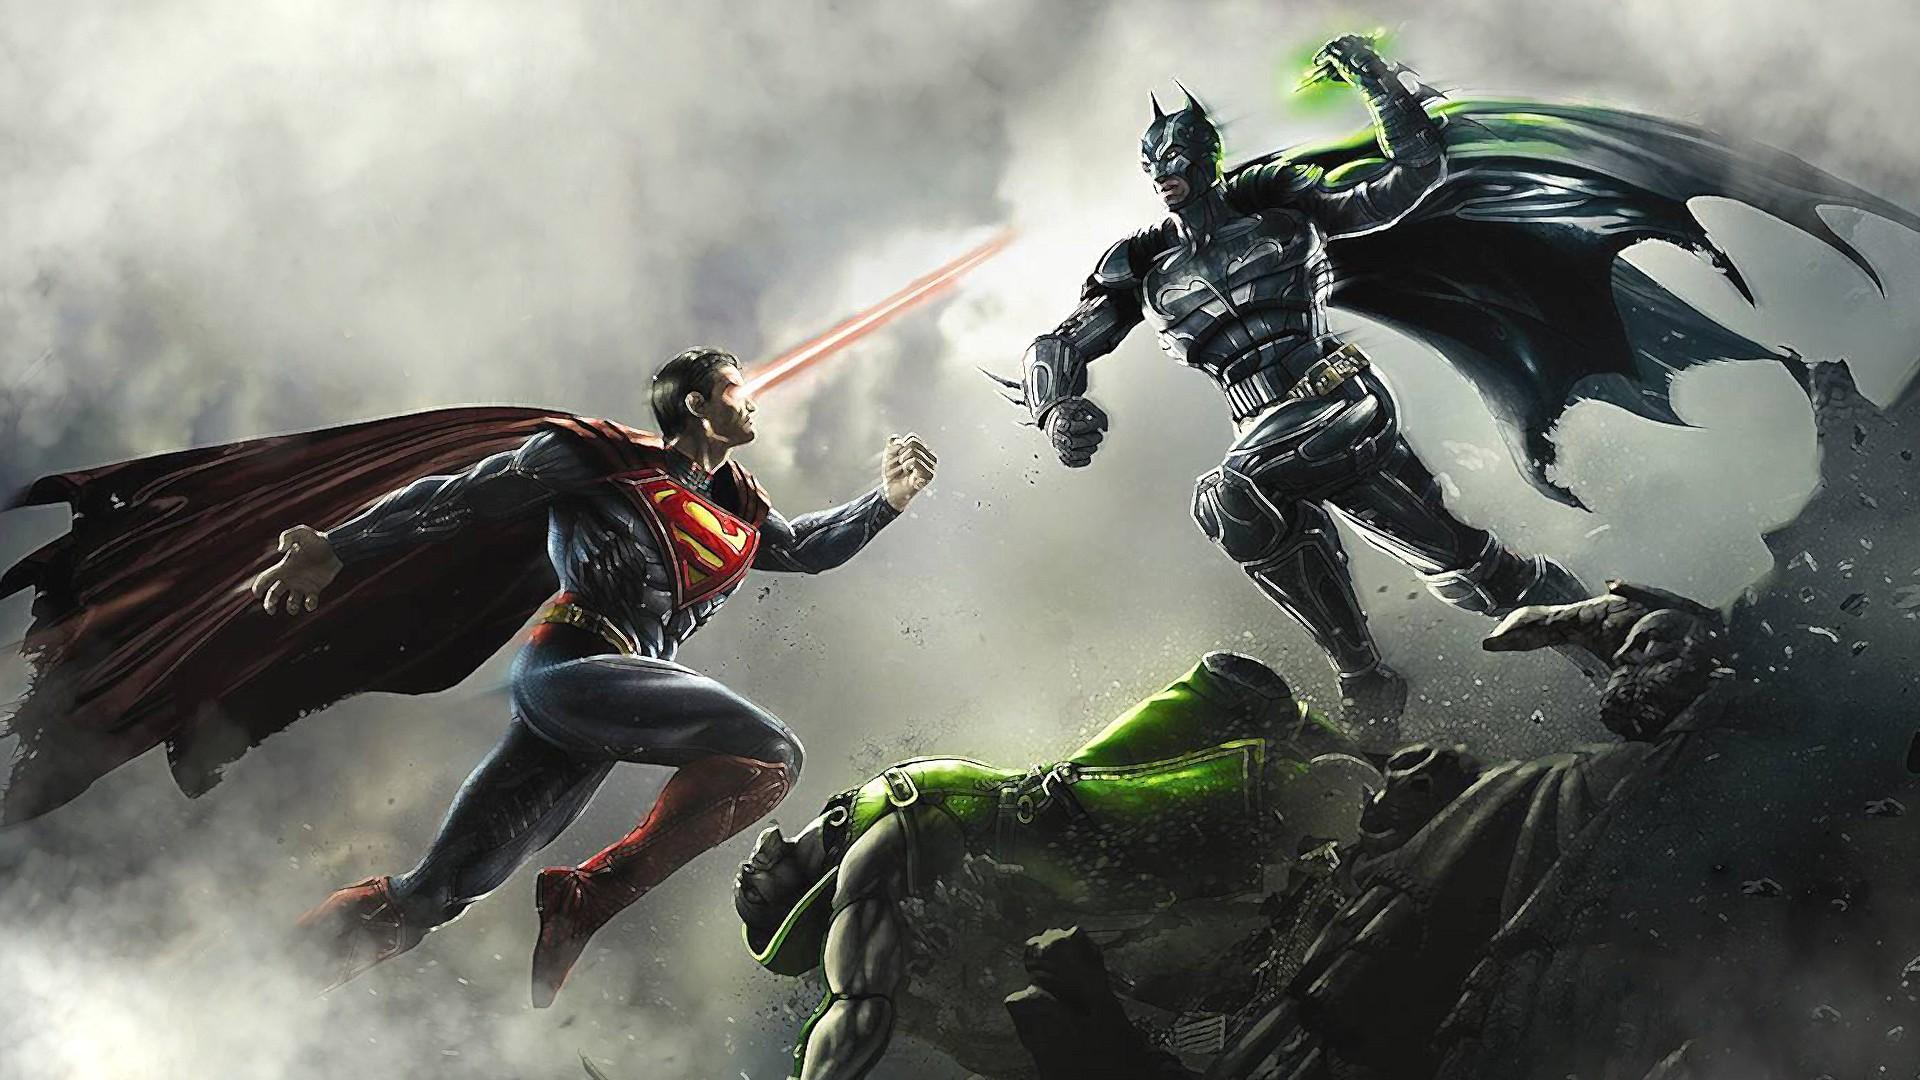 Batman Animated Wallpaper Batman And Superman Wallpaper Background Hd Download Free